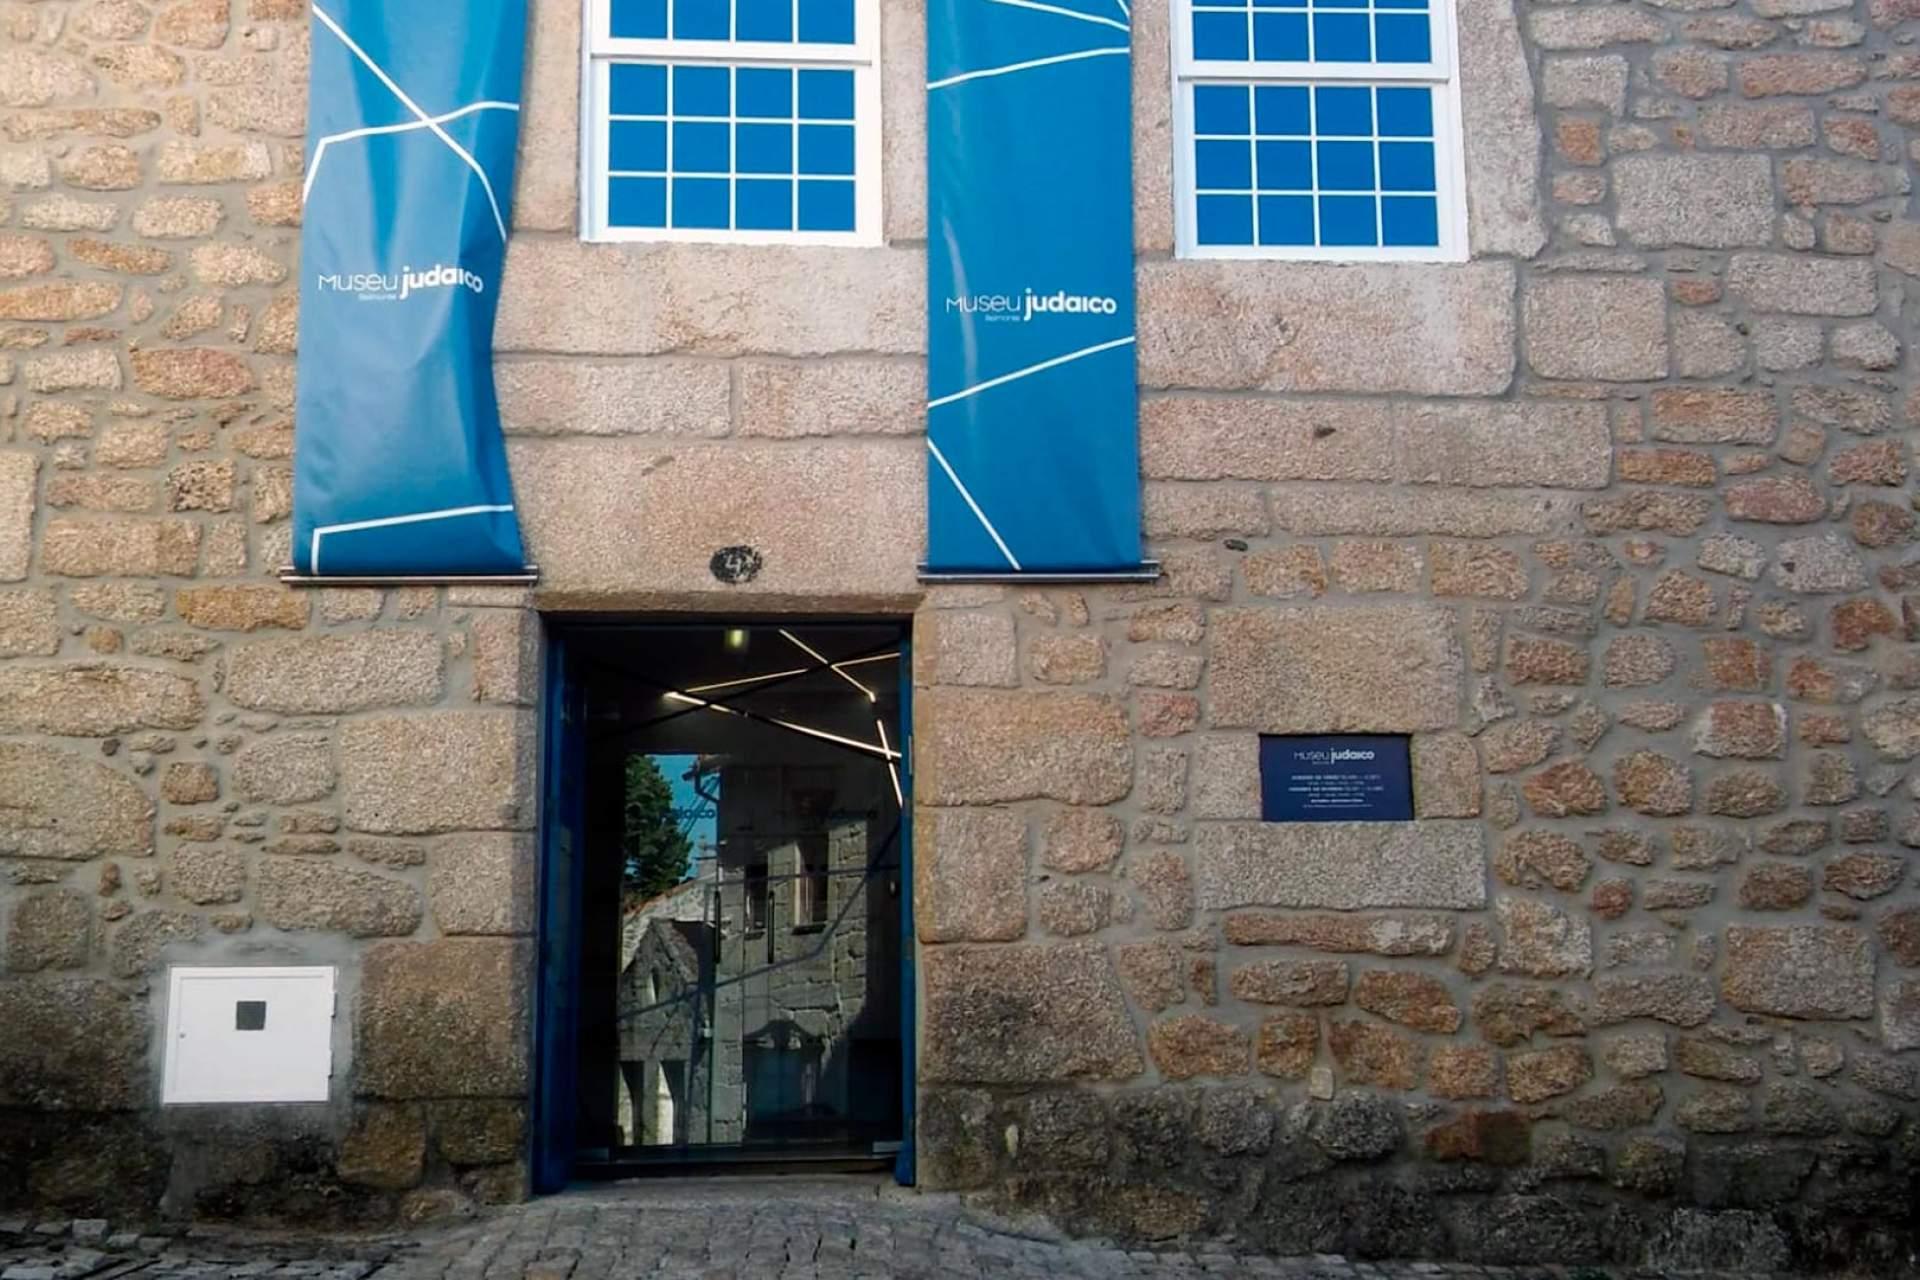 Exterior of Belmonte Jewish Museum / Belmonte / EMPDS - Empresa Municipal de Belmonte